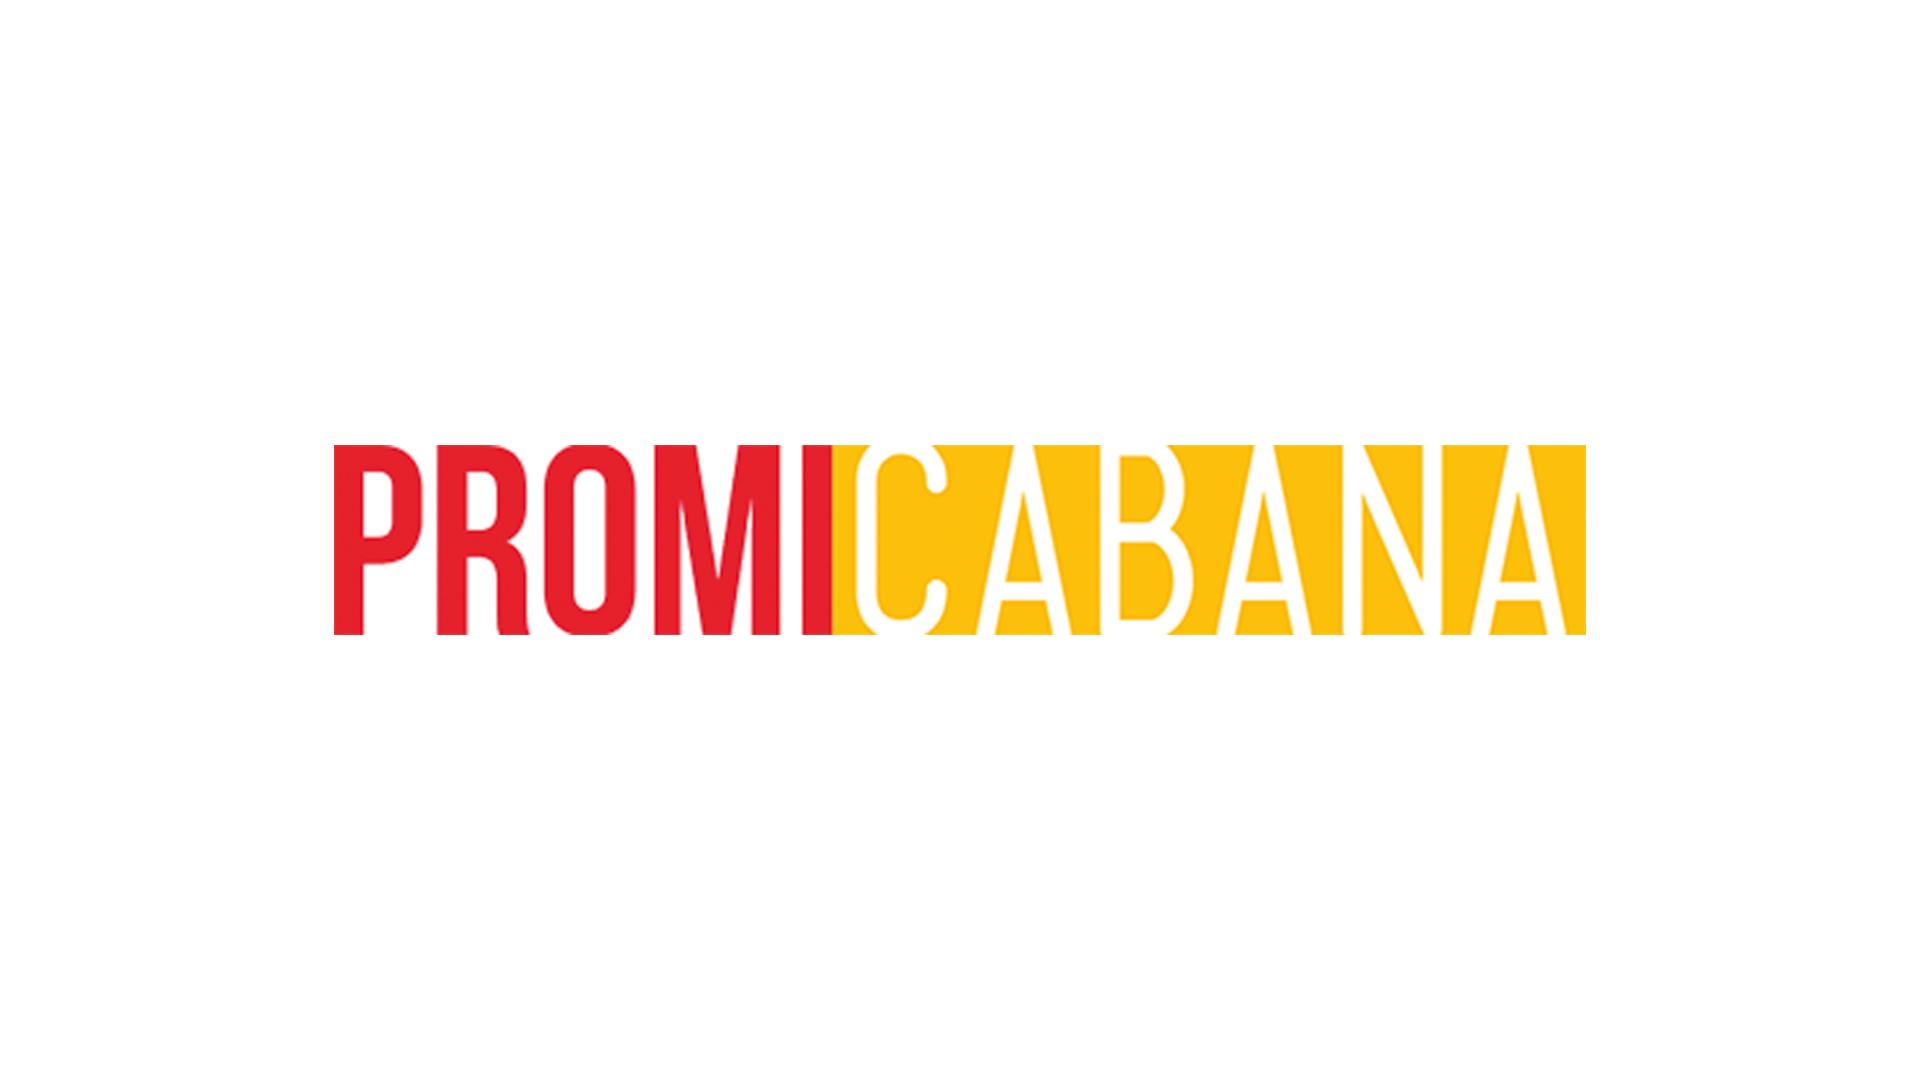 Dr-Seuss-Taylor-Swift-Zac-Efron